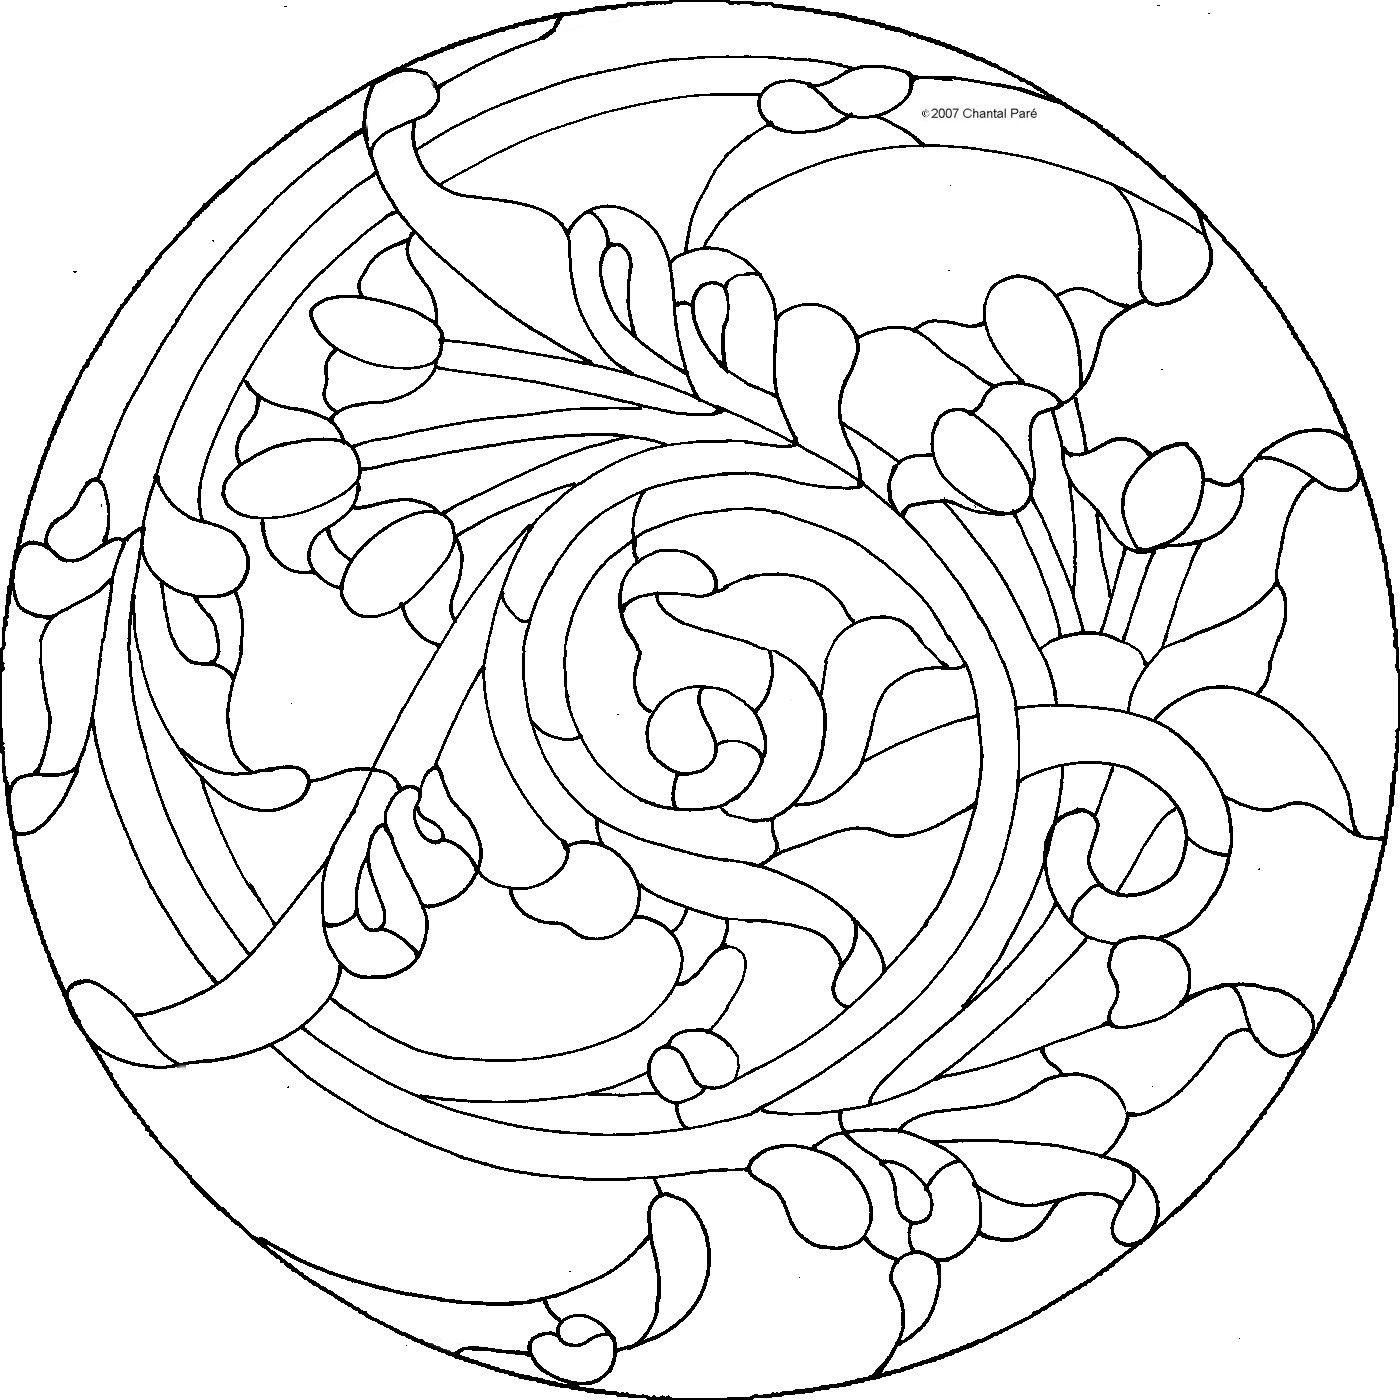 Pin de Saeideh en vitray | Pinterest | Mandalas, Repujado en metal y ...